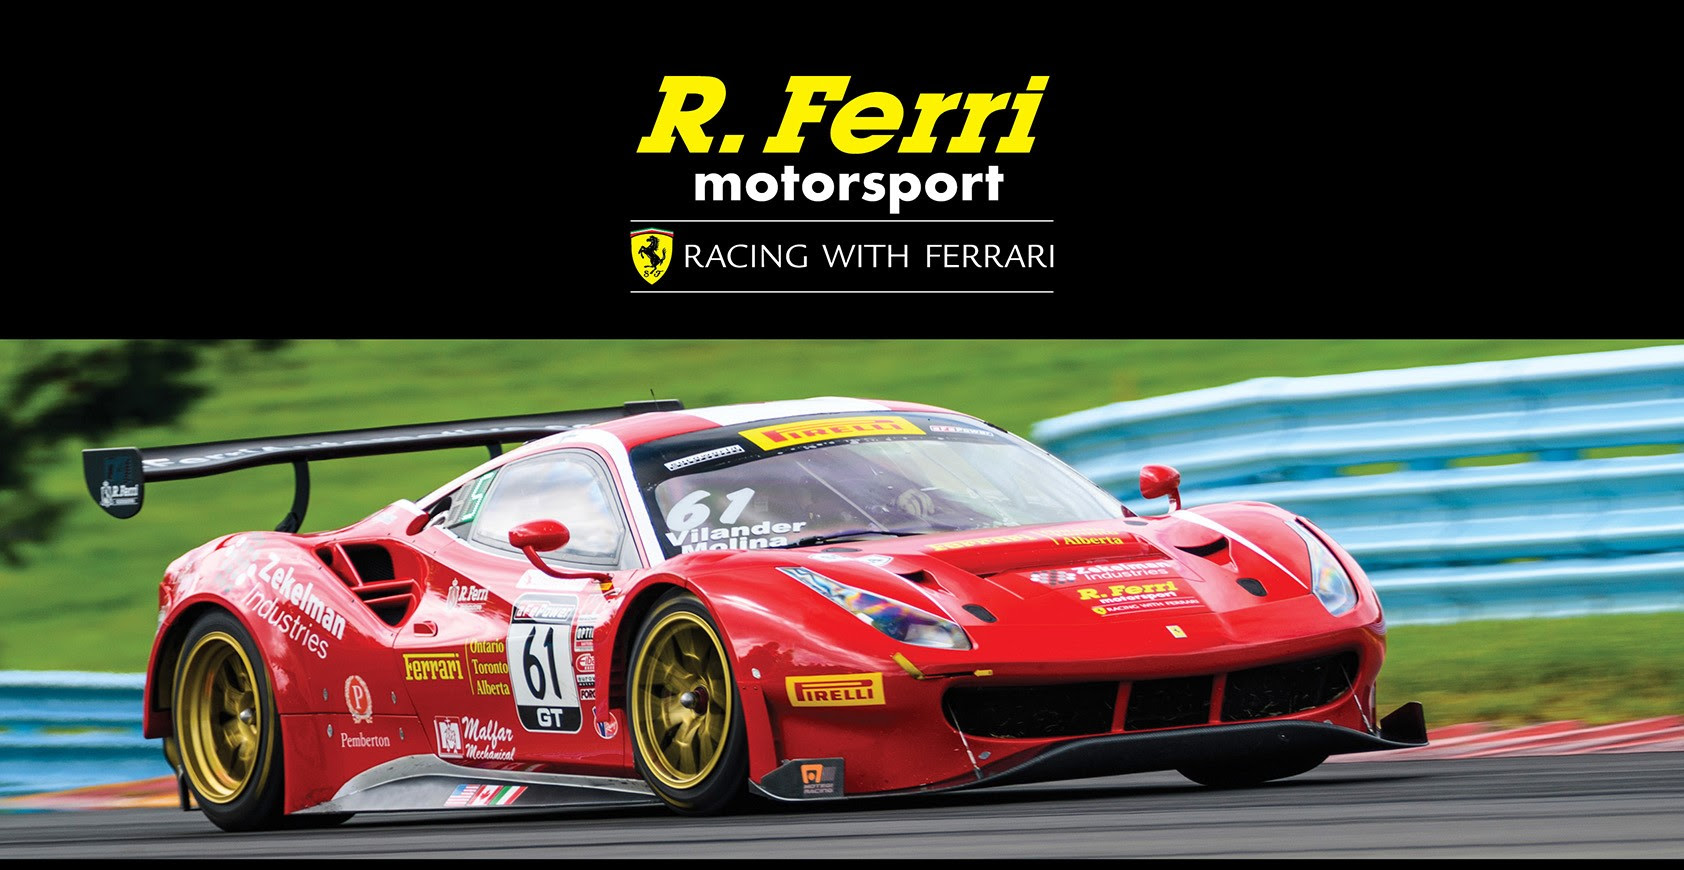 Rferri Motorsport Racing With Ferrari Returns To The